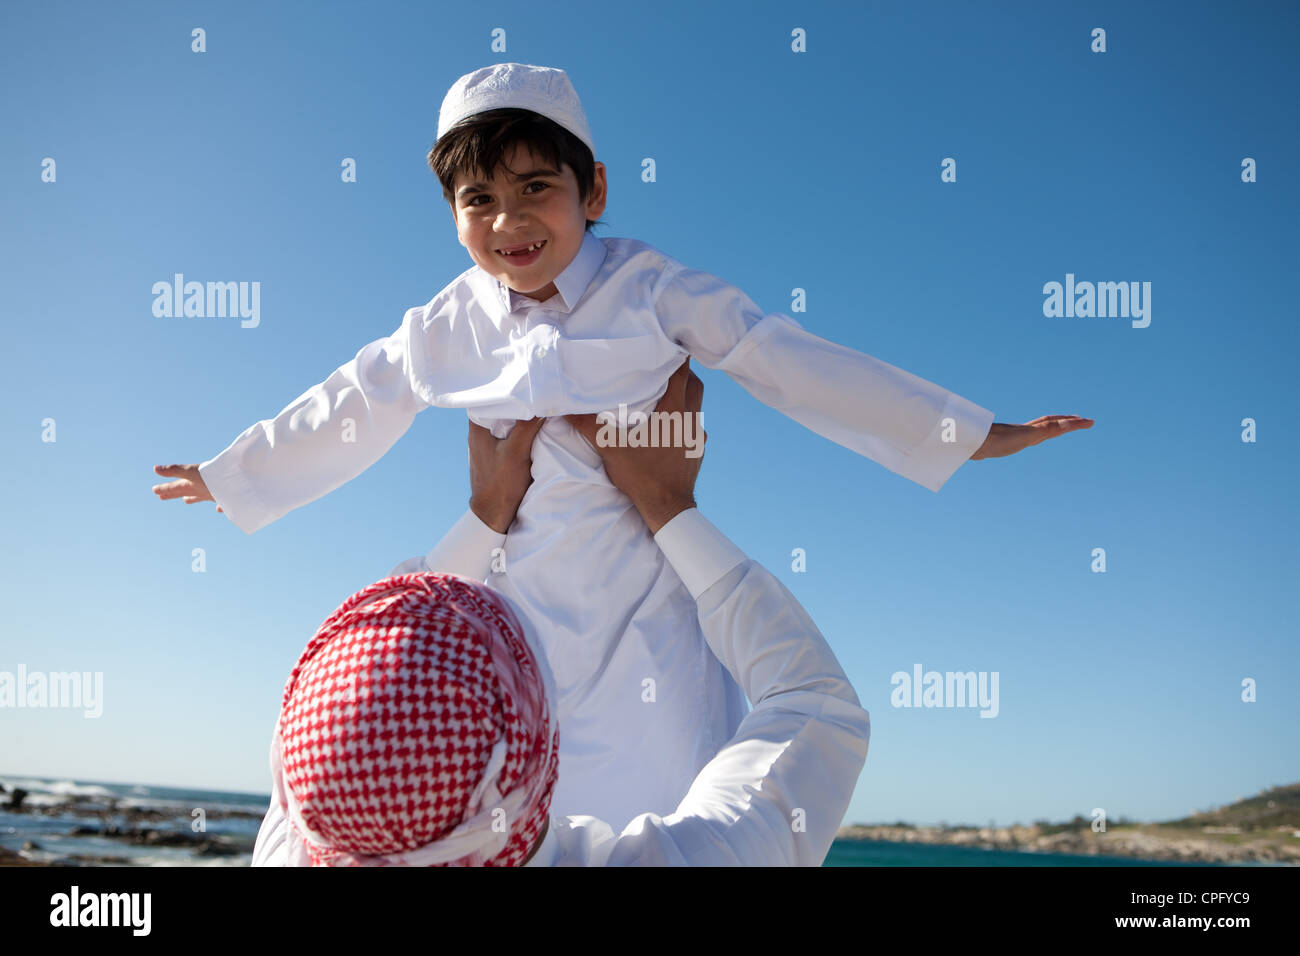 Porträt der Arabische Vater heben seinen Sohn am Strand, junge erhobenen Armen. Stockbild